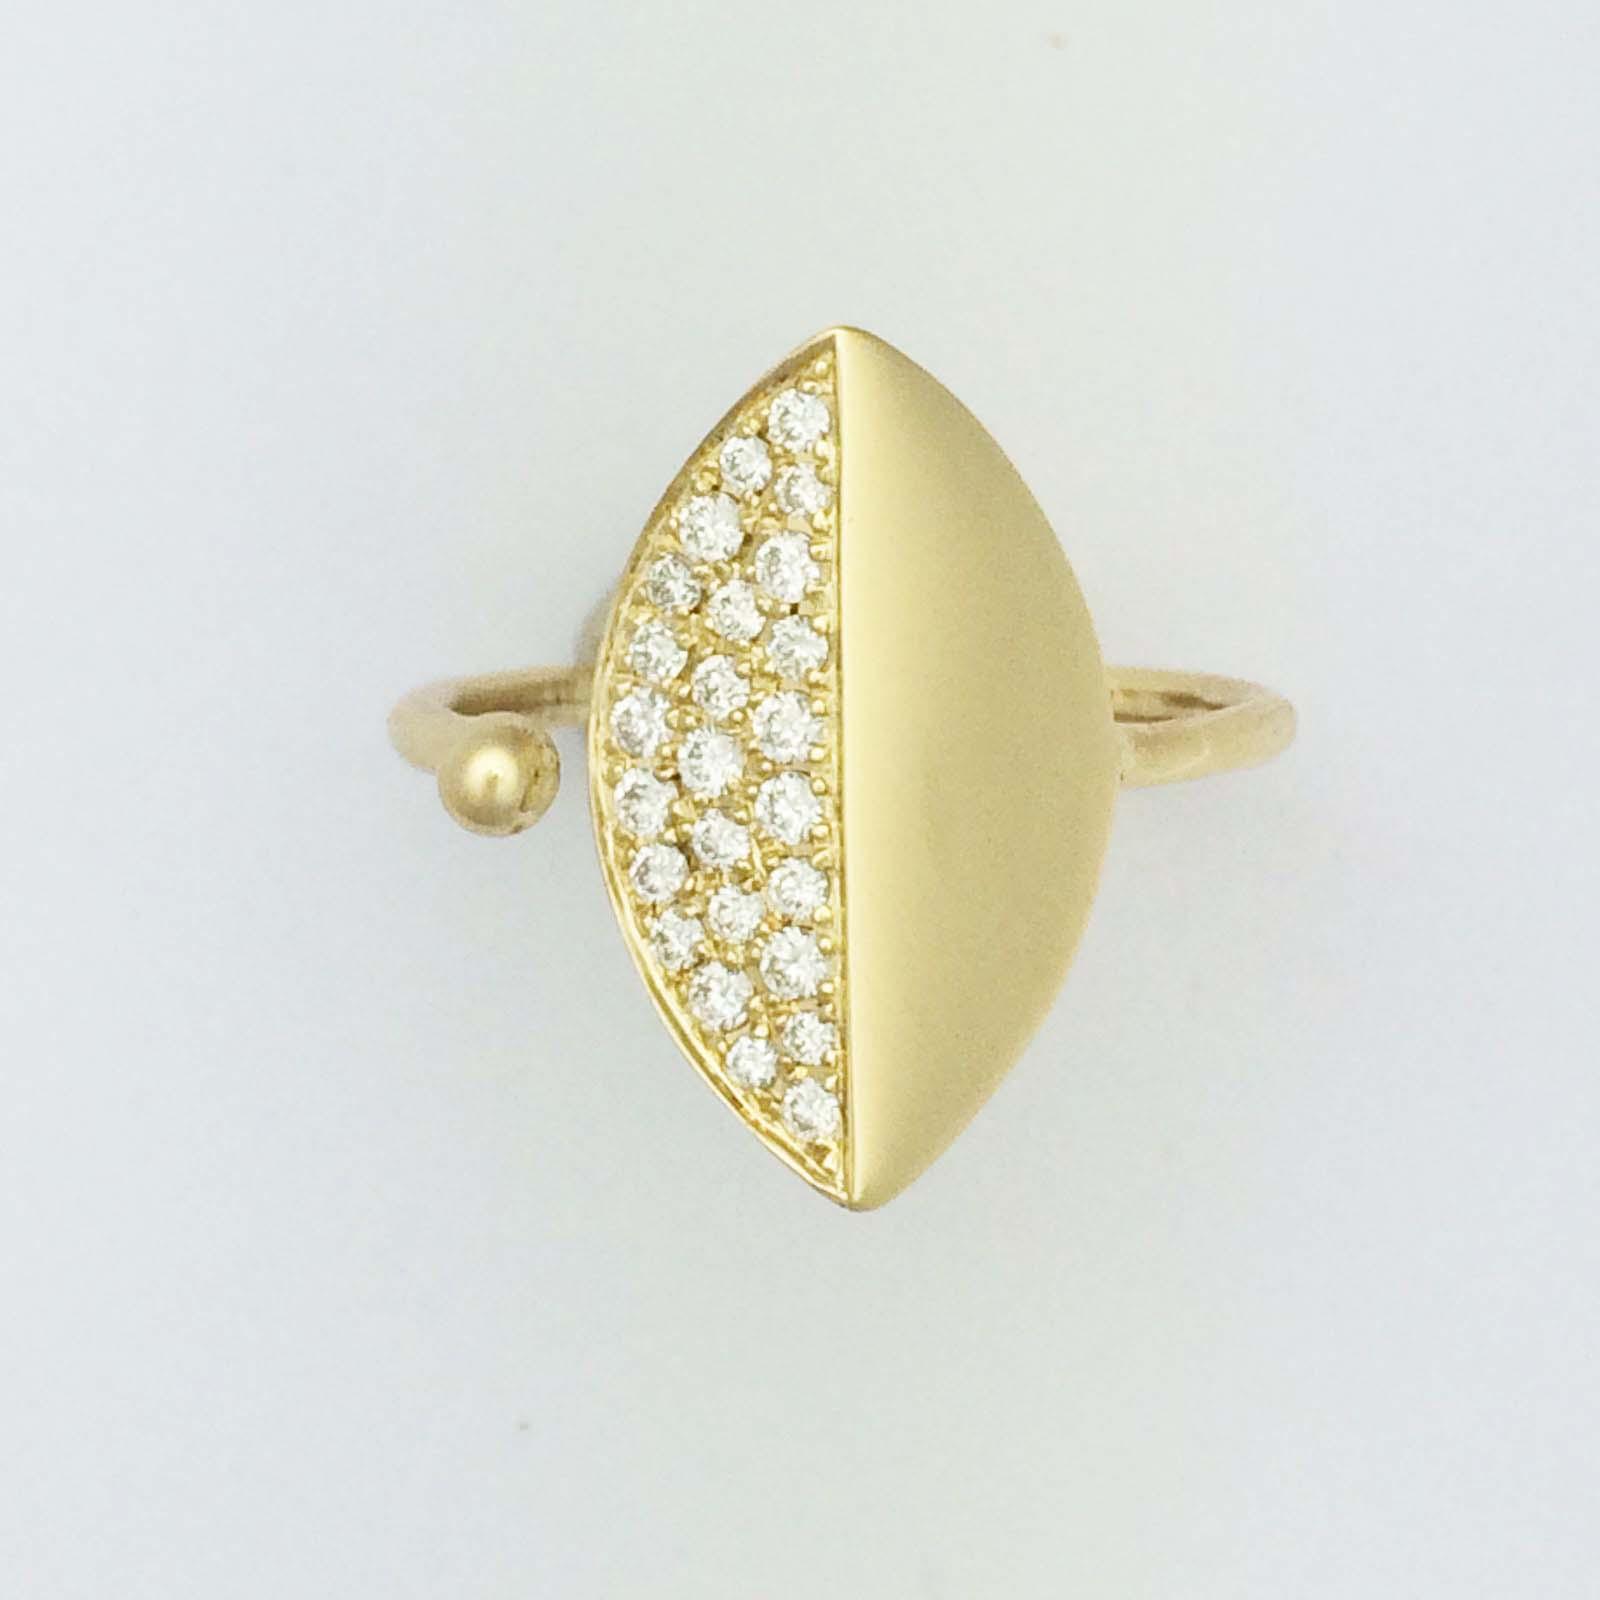 18k Diamond leaf ring